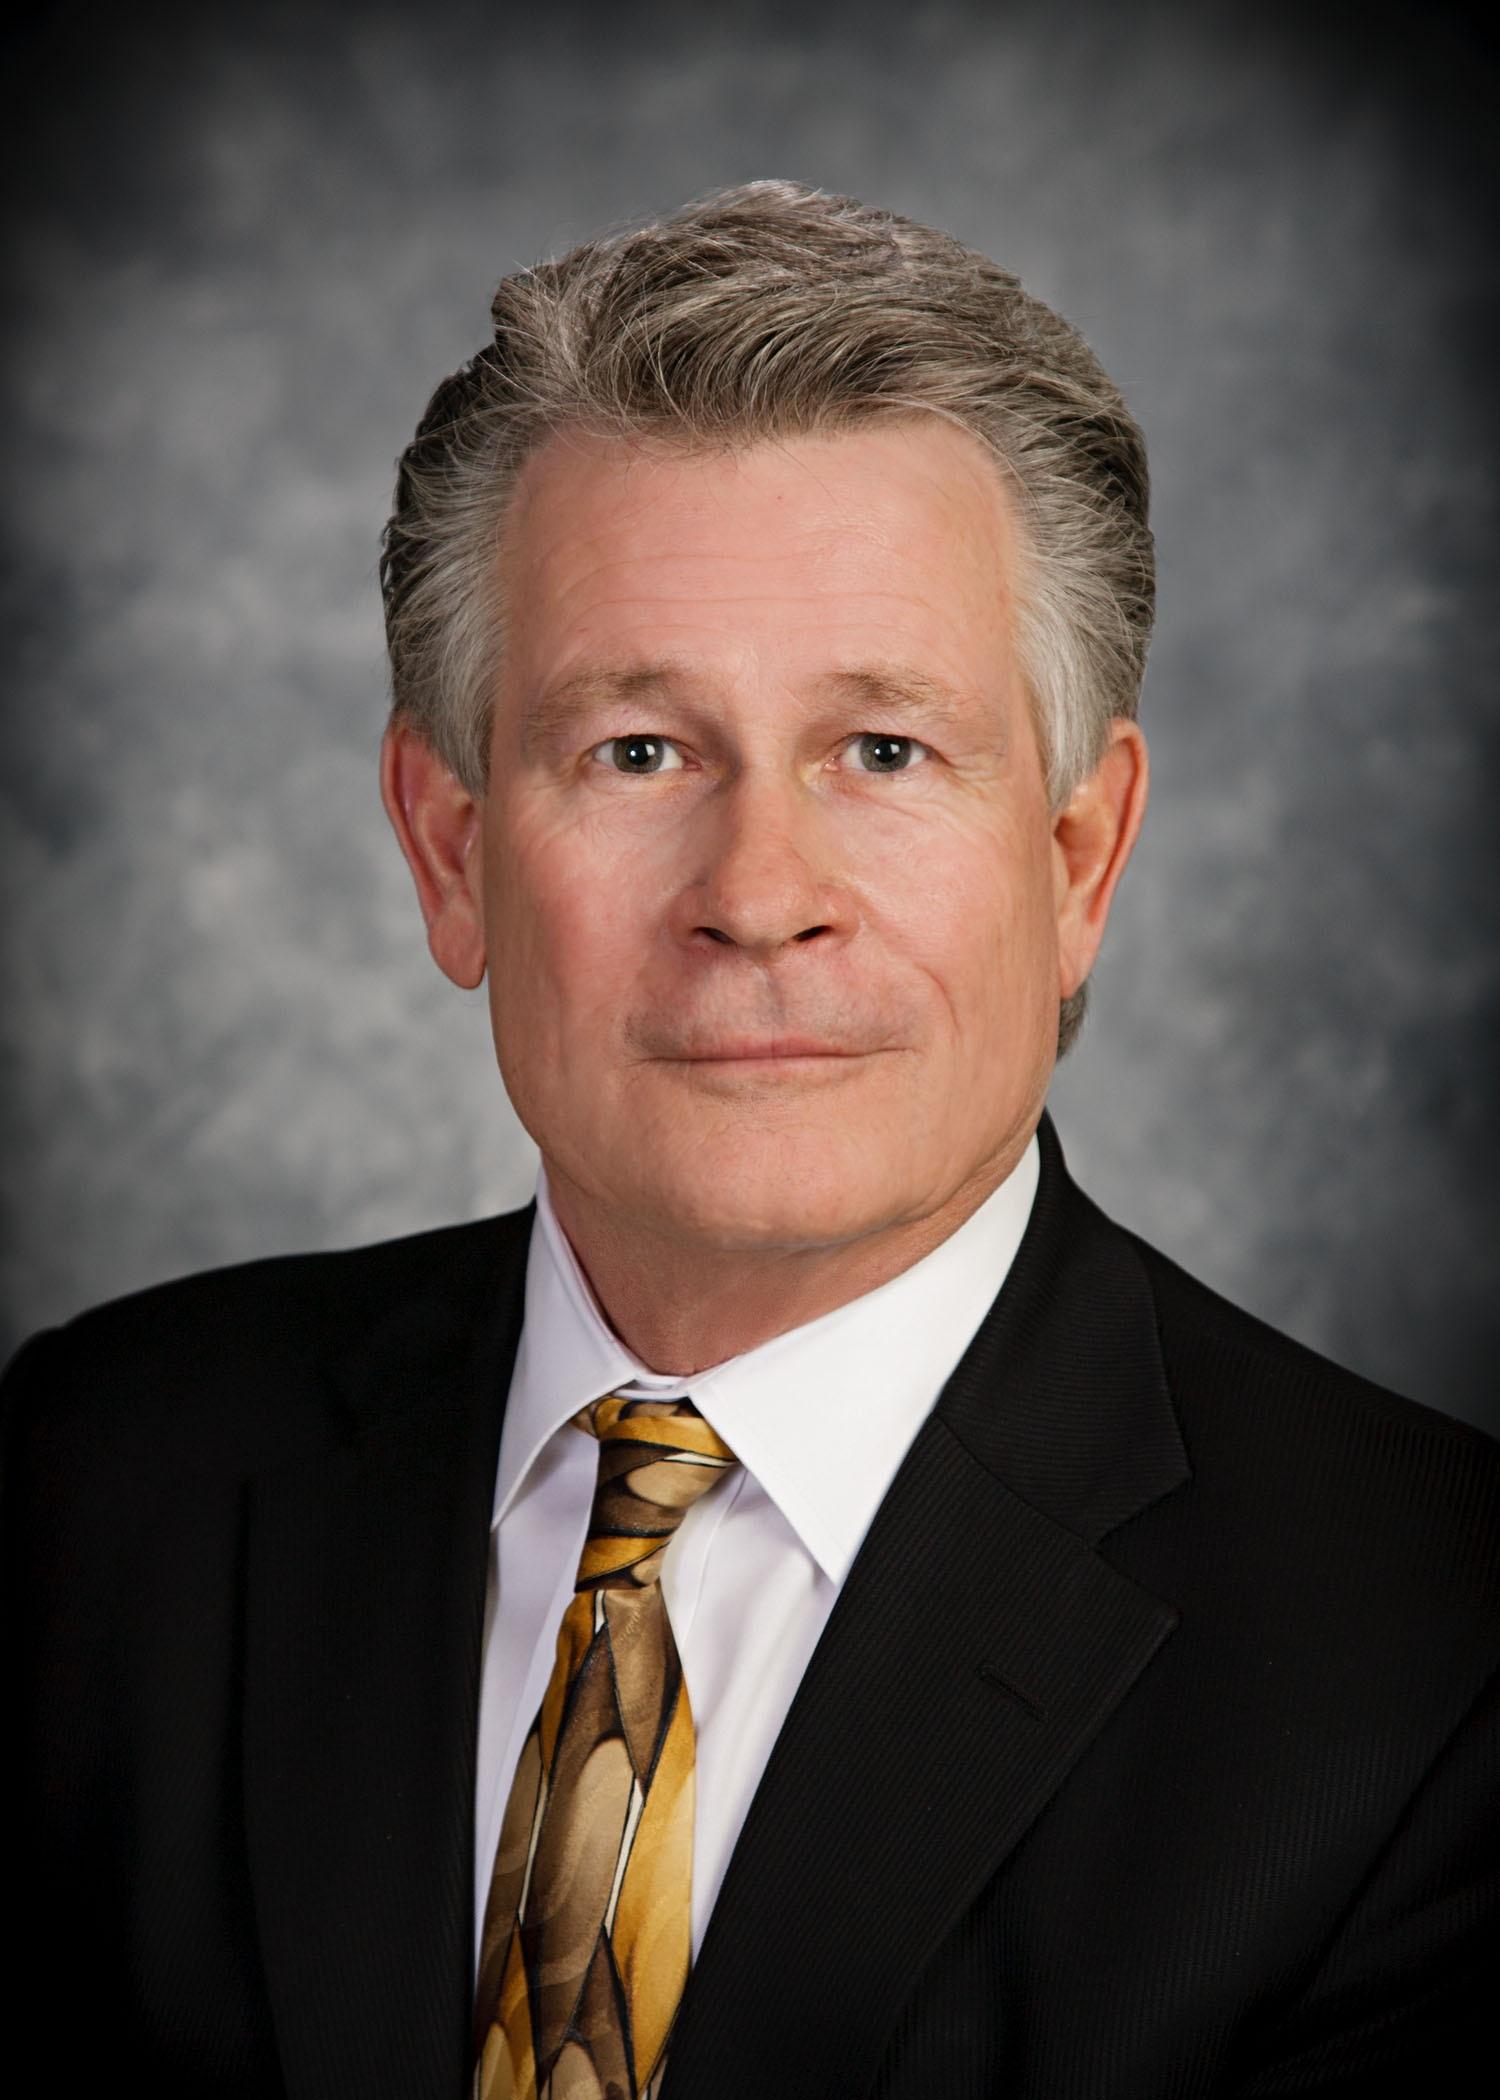 Stephen Thompson